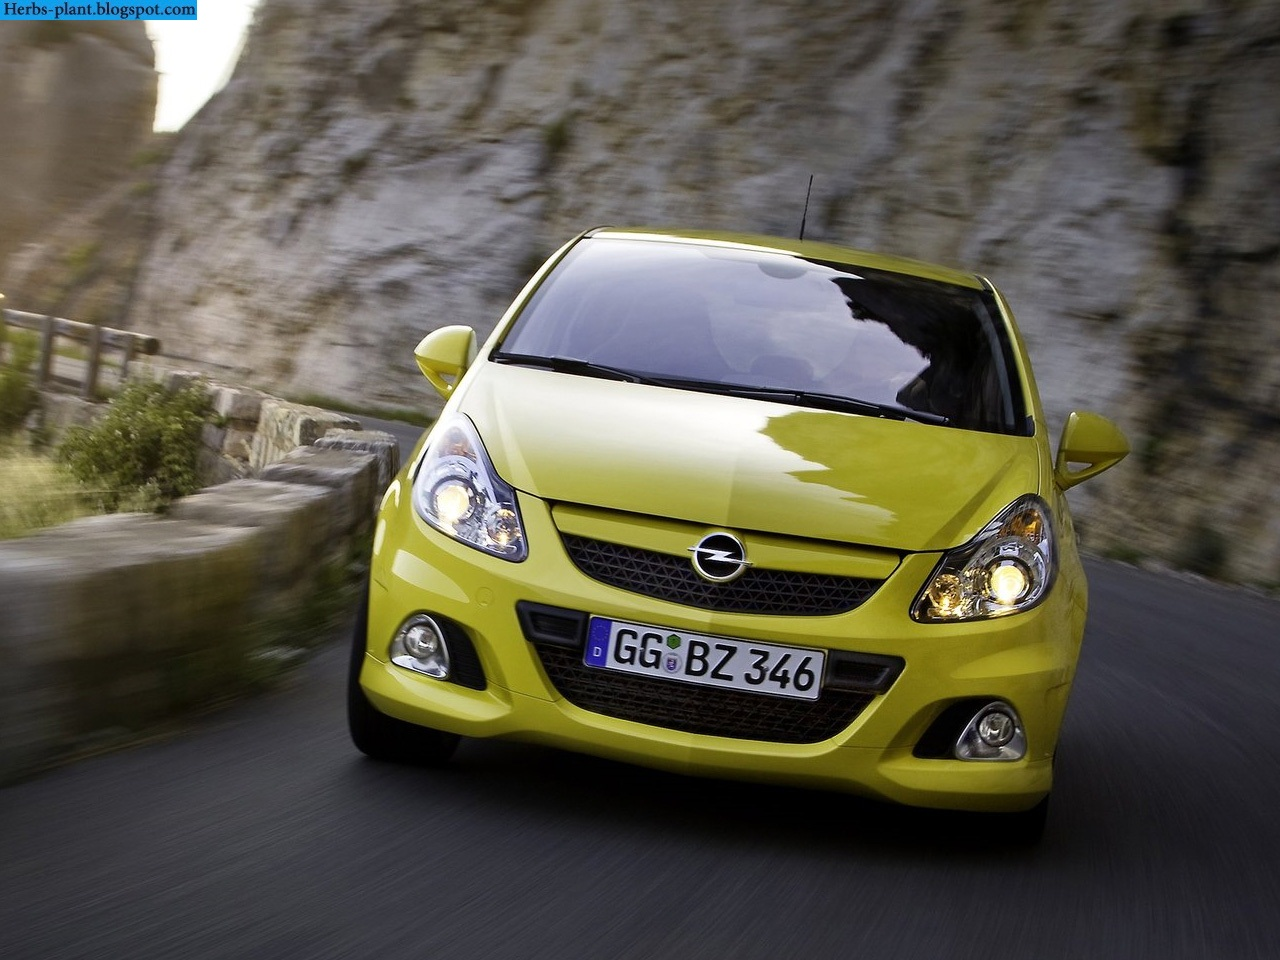 Opel corsa car 2013 front view - صور سيارة اوبل كورسا 2013 من الخارج